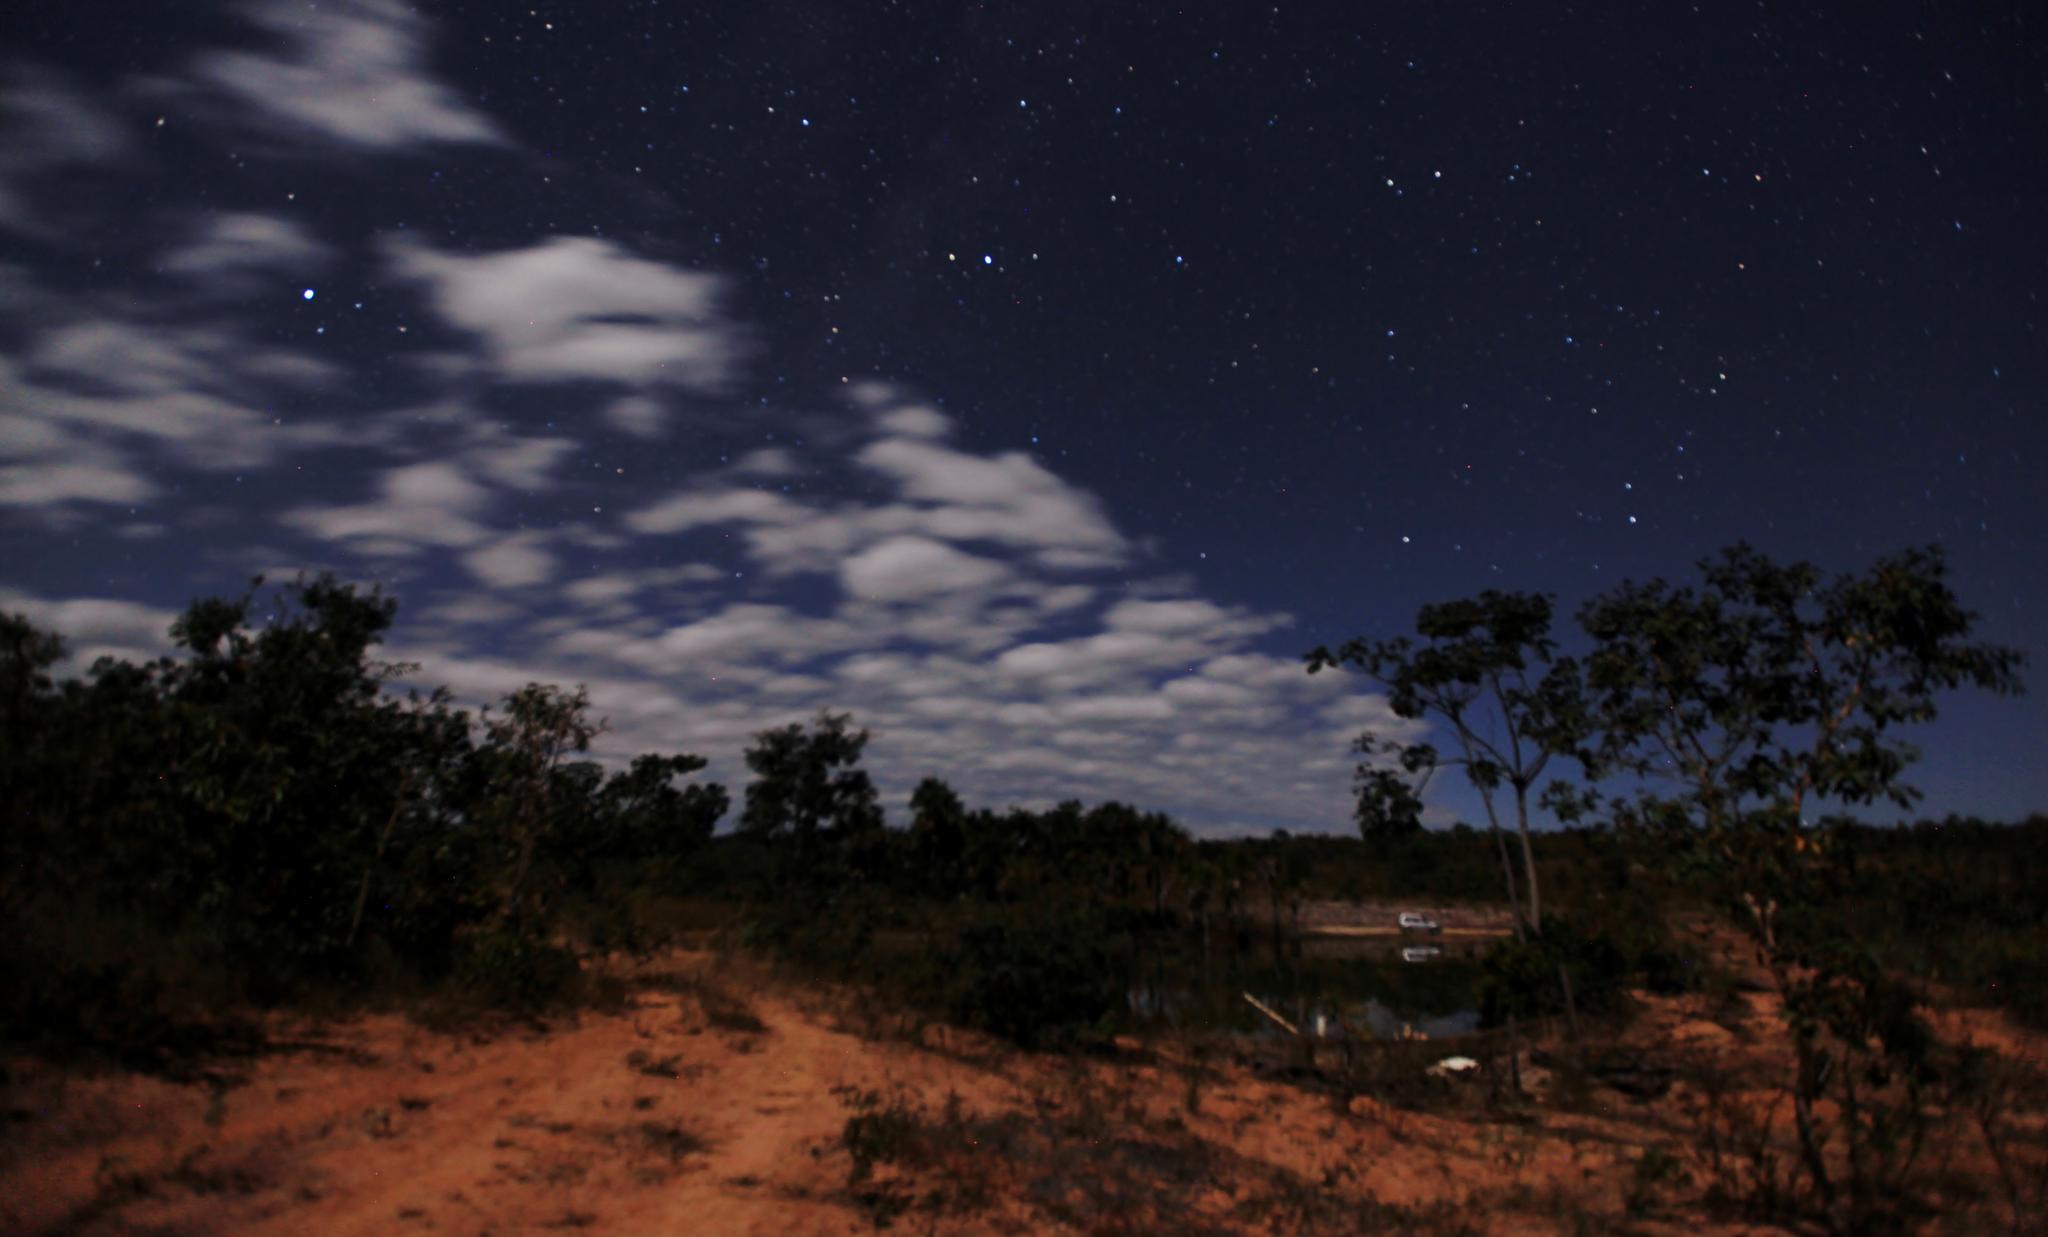 At night by Ricardo Resende